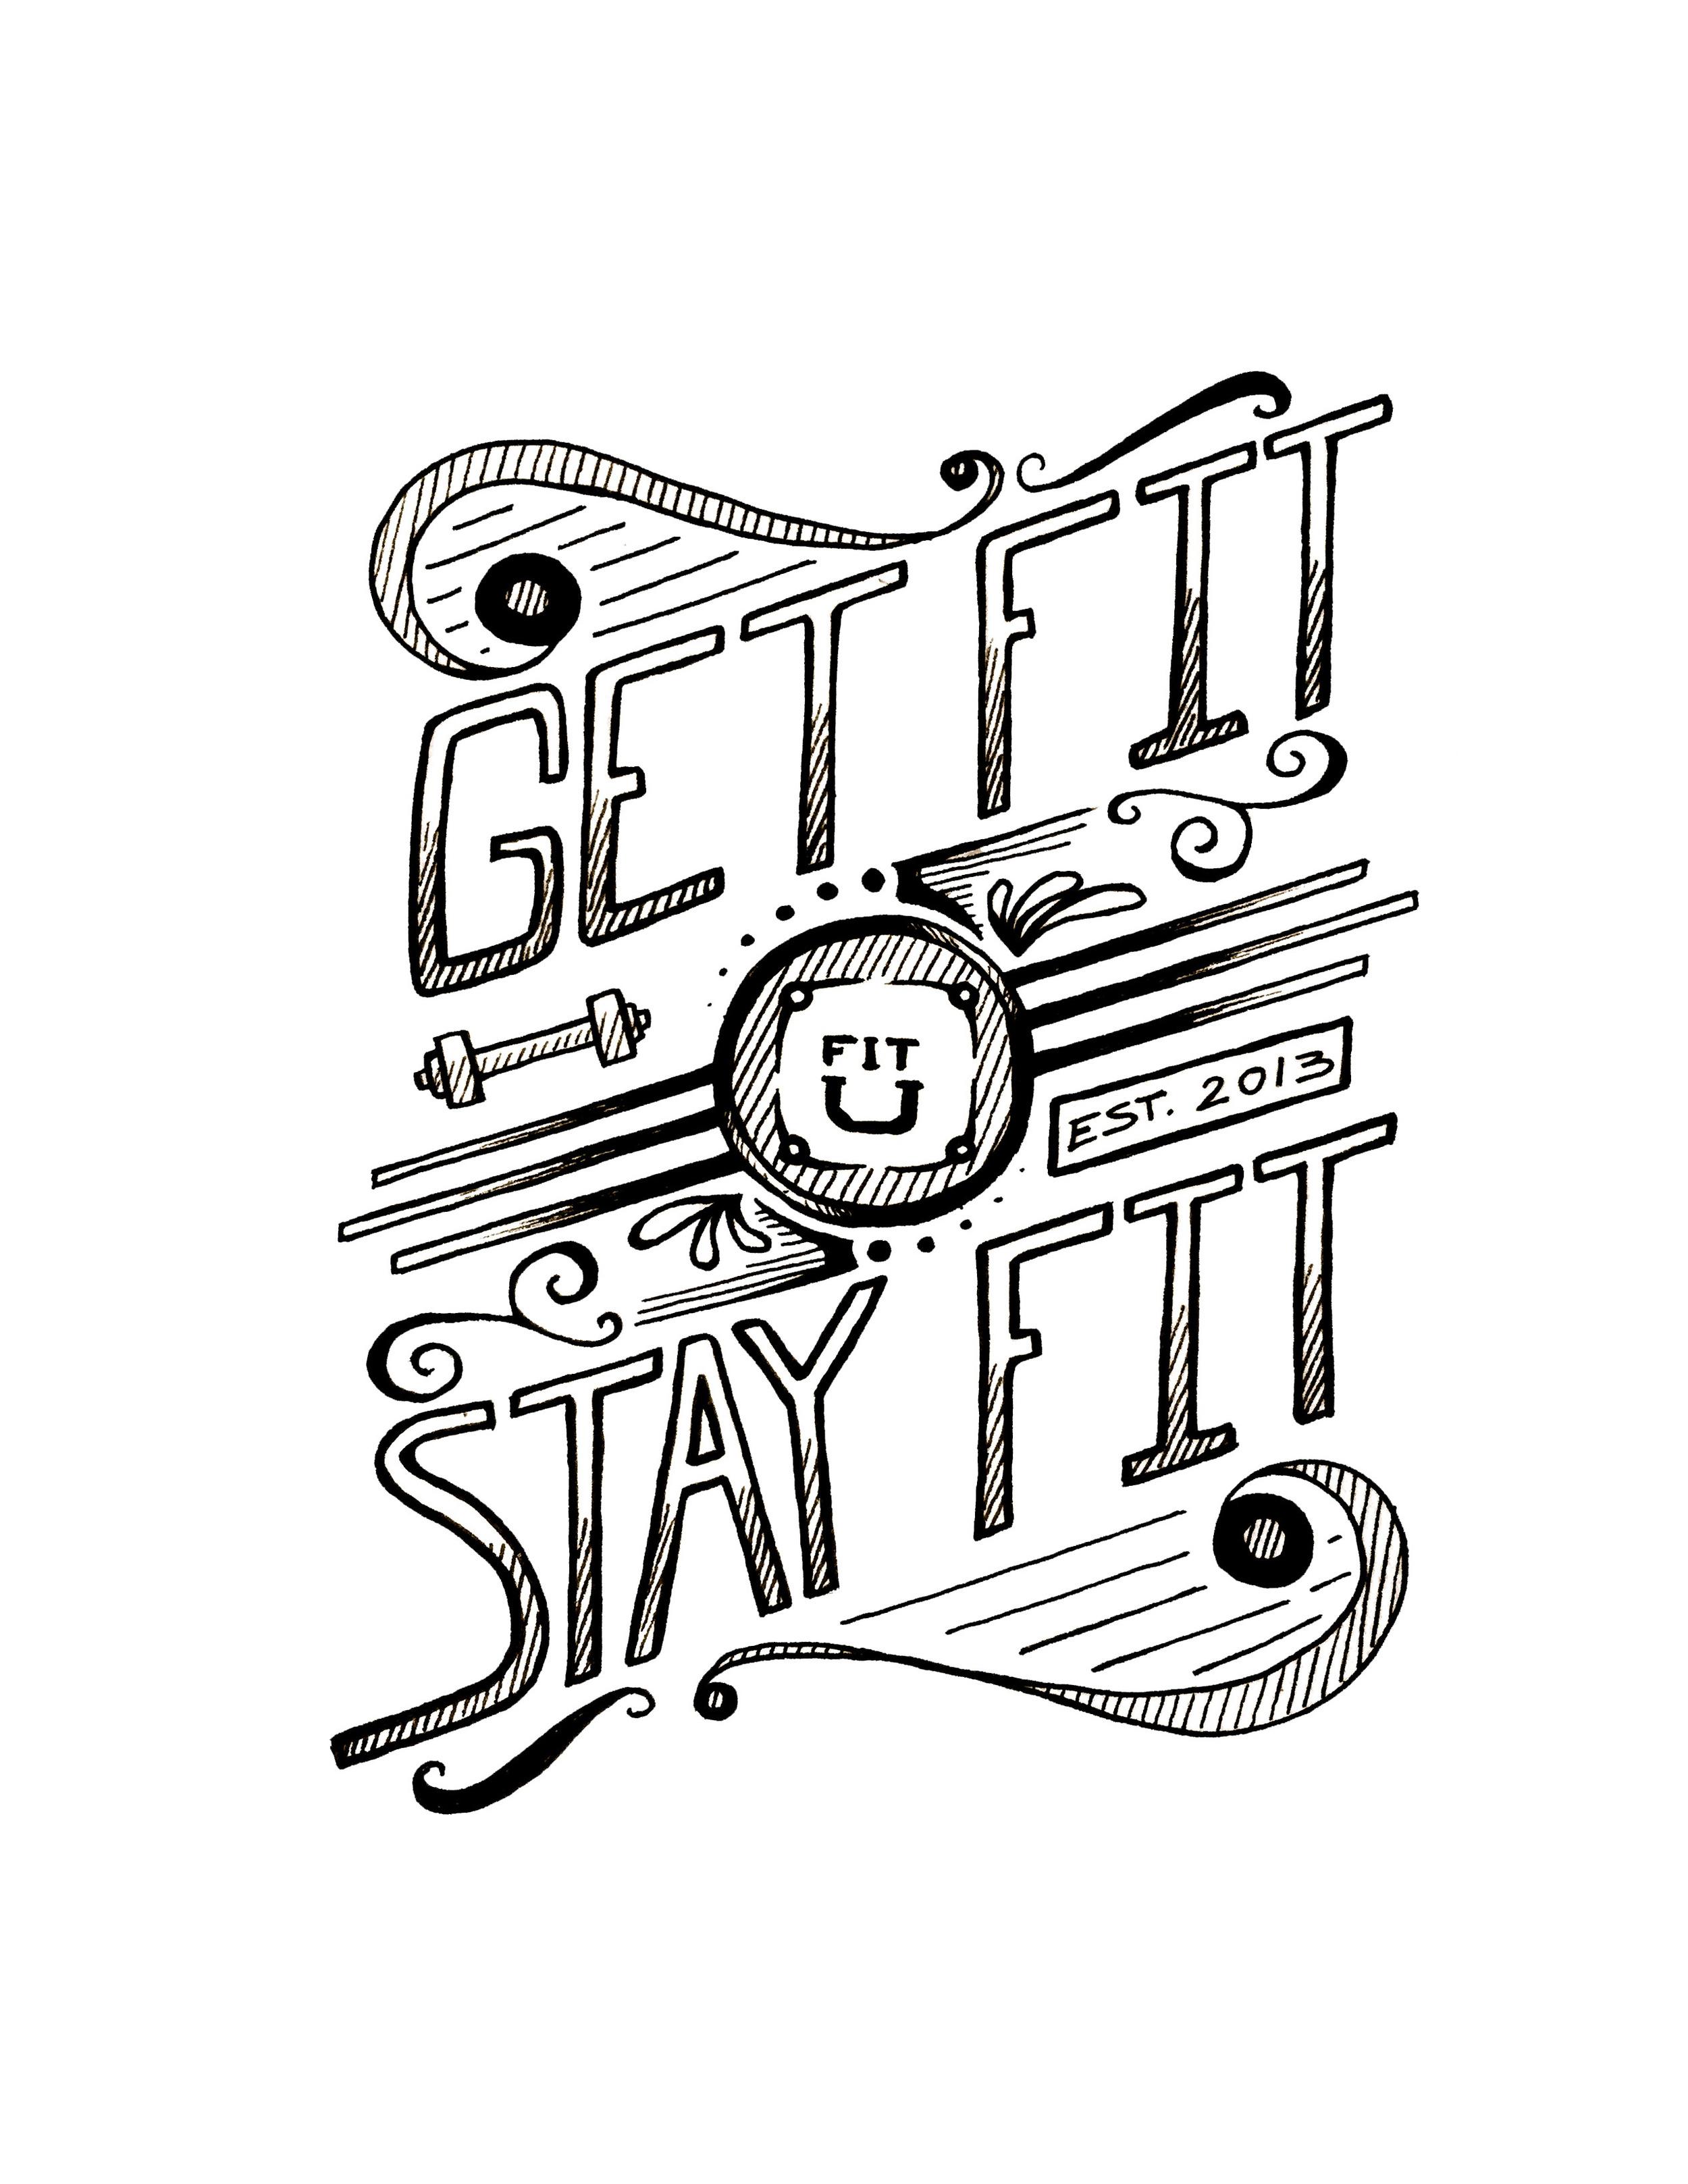 GFSF1.jpg